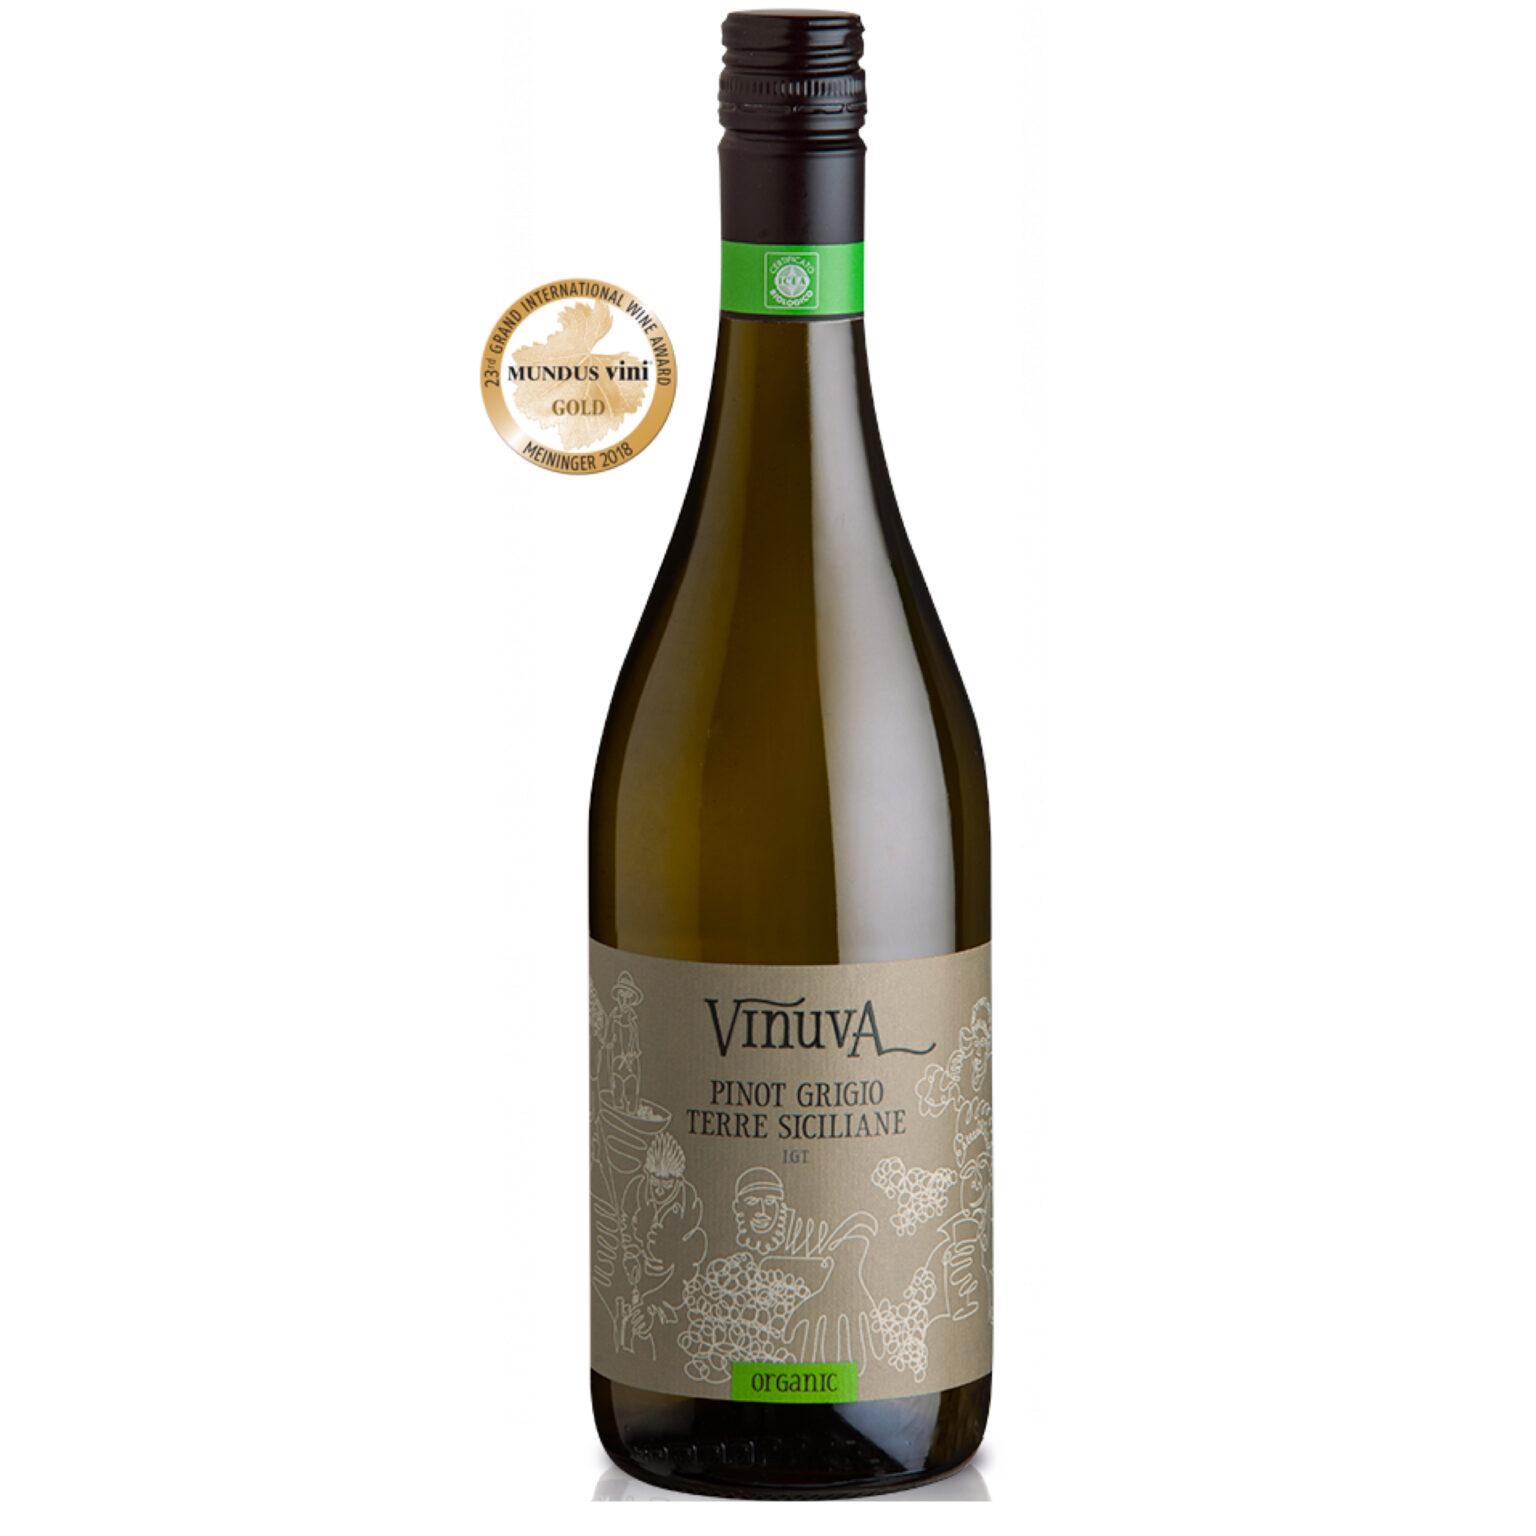 Vinuva Pinot Grigio Terre Siciliane